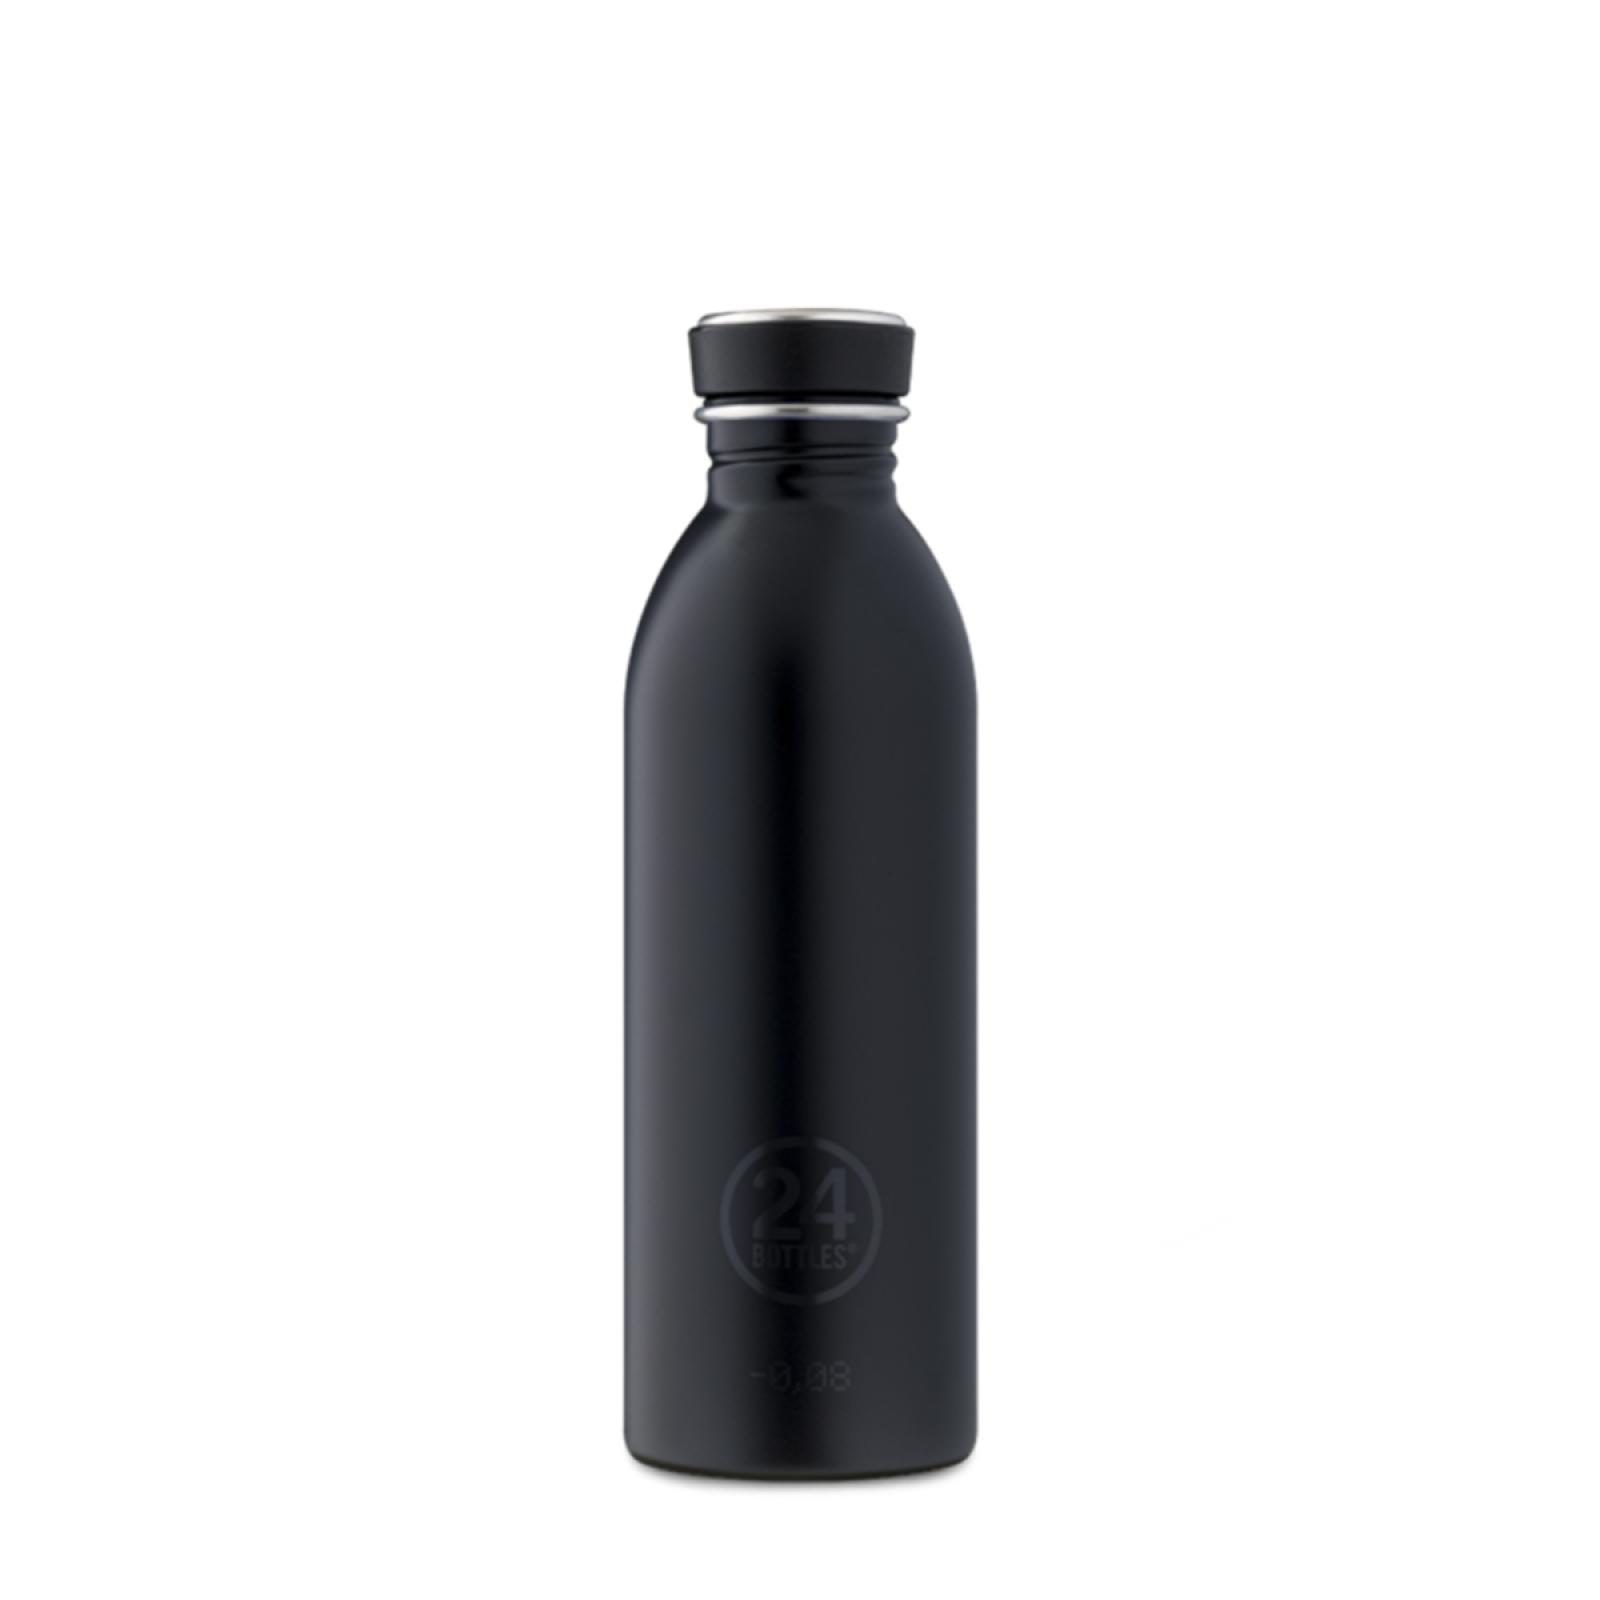 24BO Urban Bottle Black 500 ml - 1